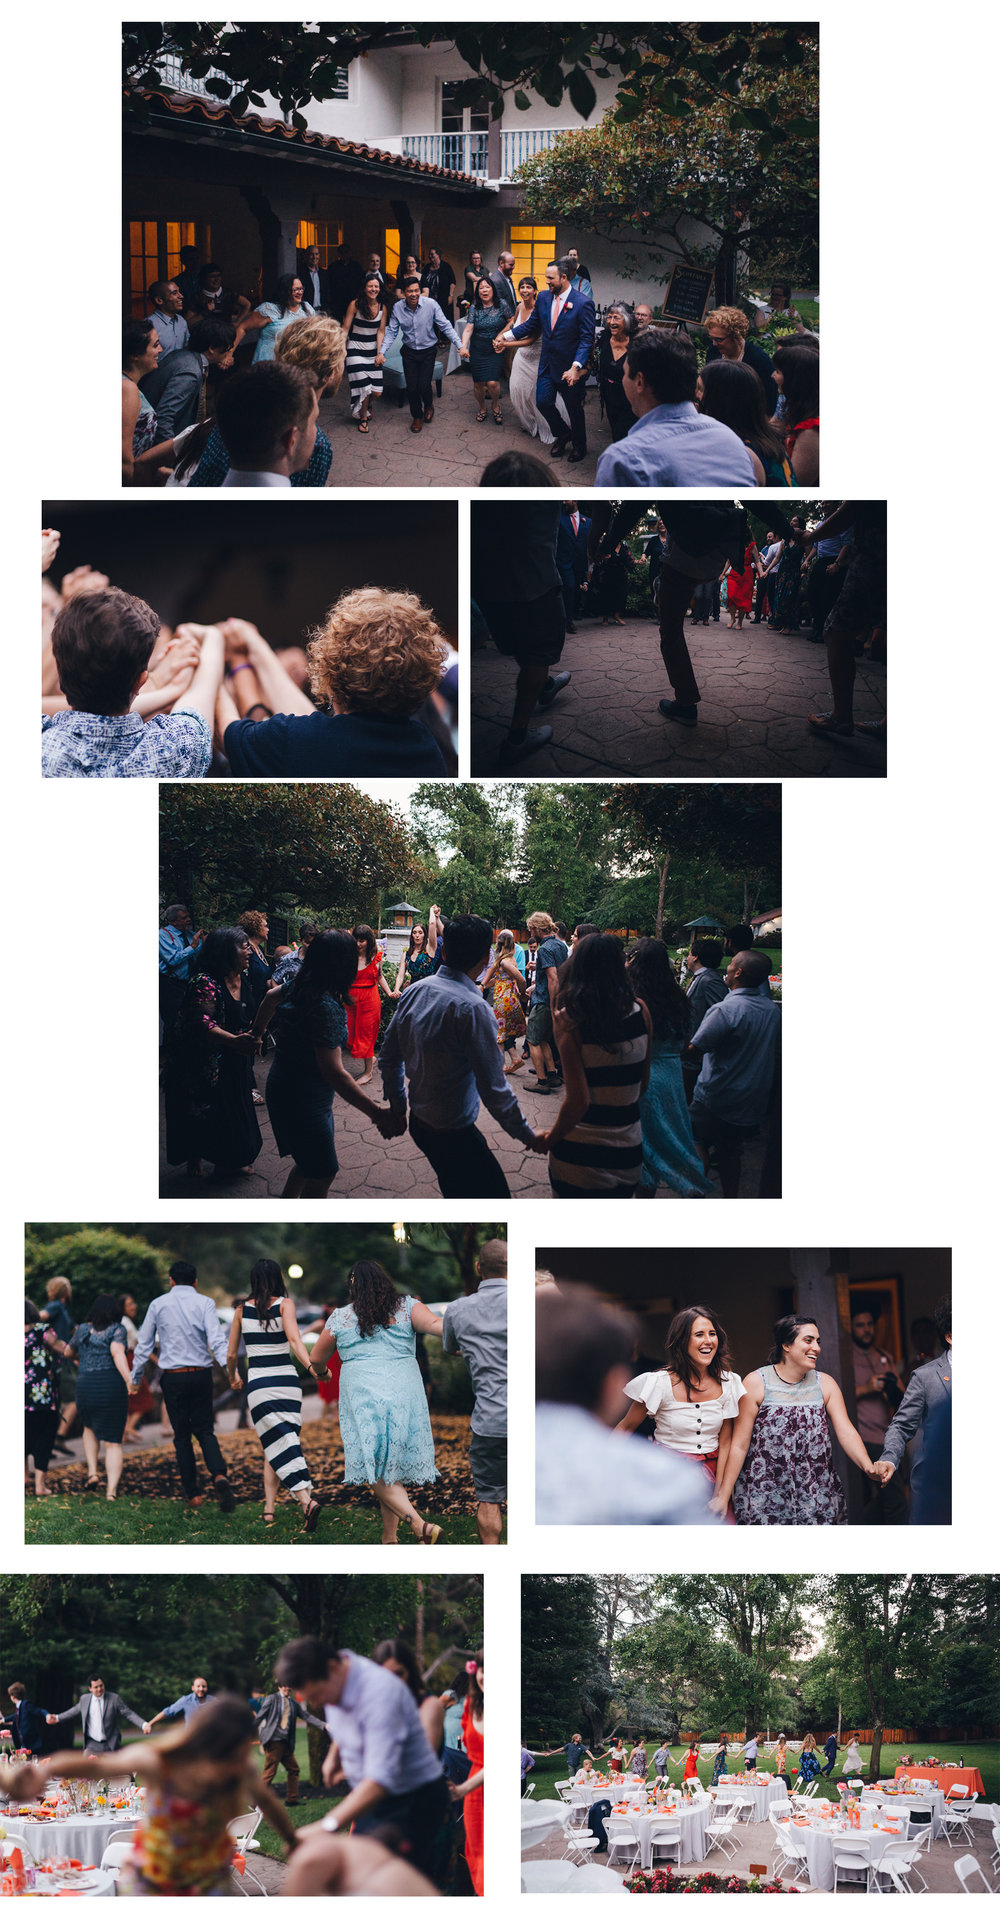 IG_wedding (94 of 110) copy.jpg